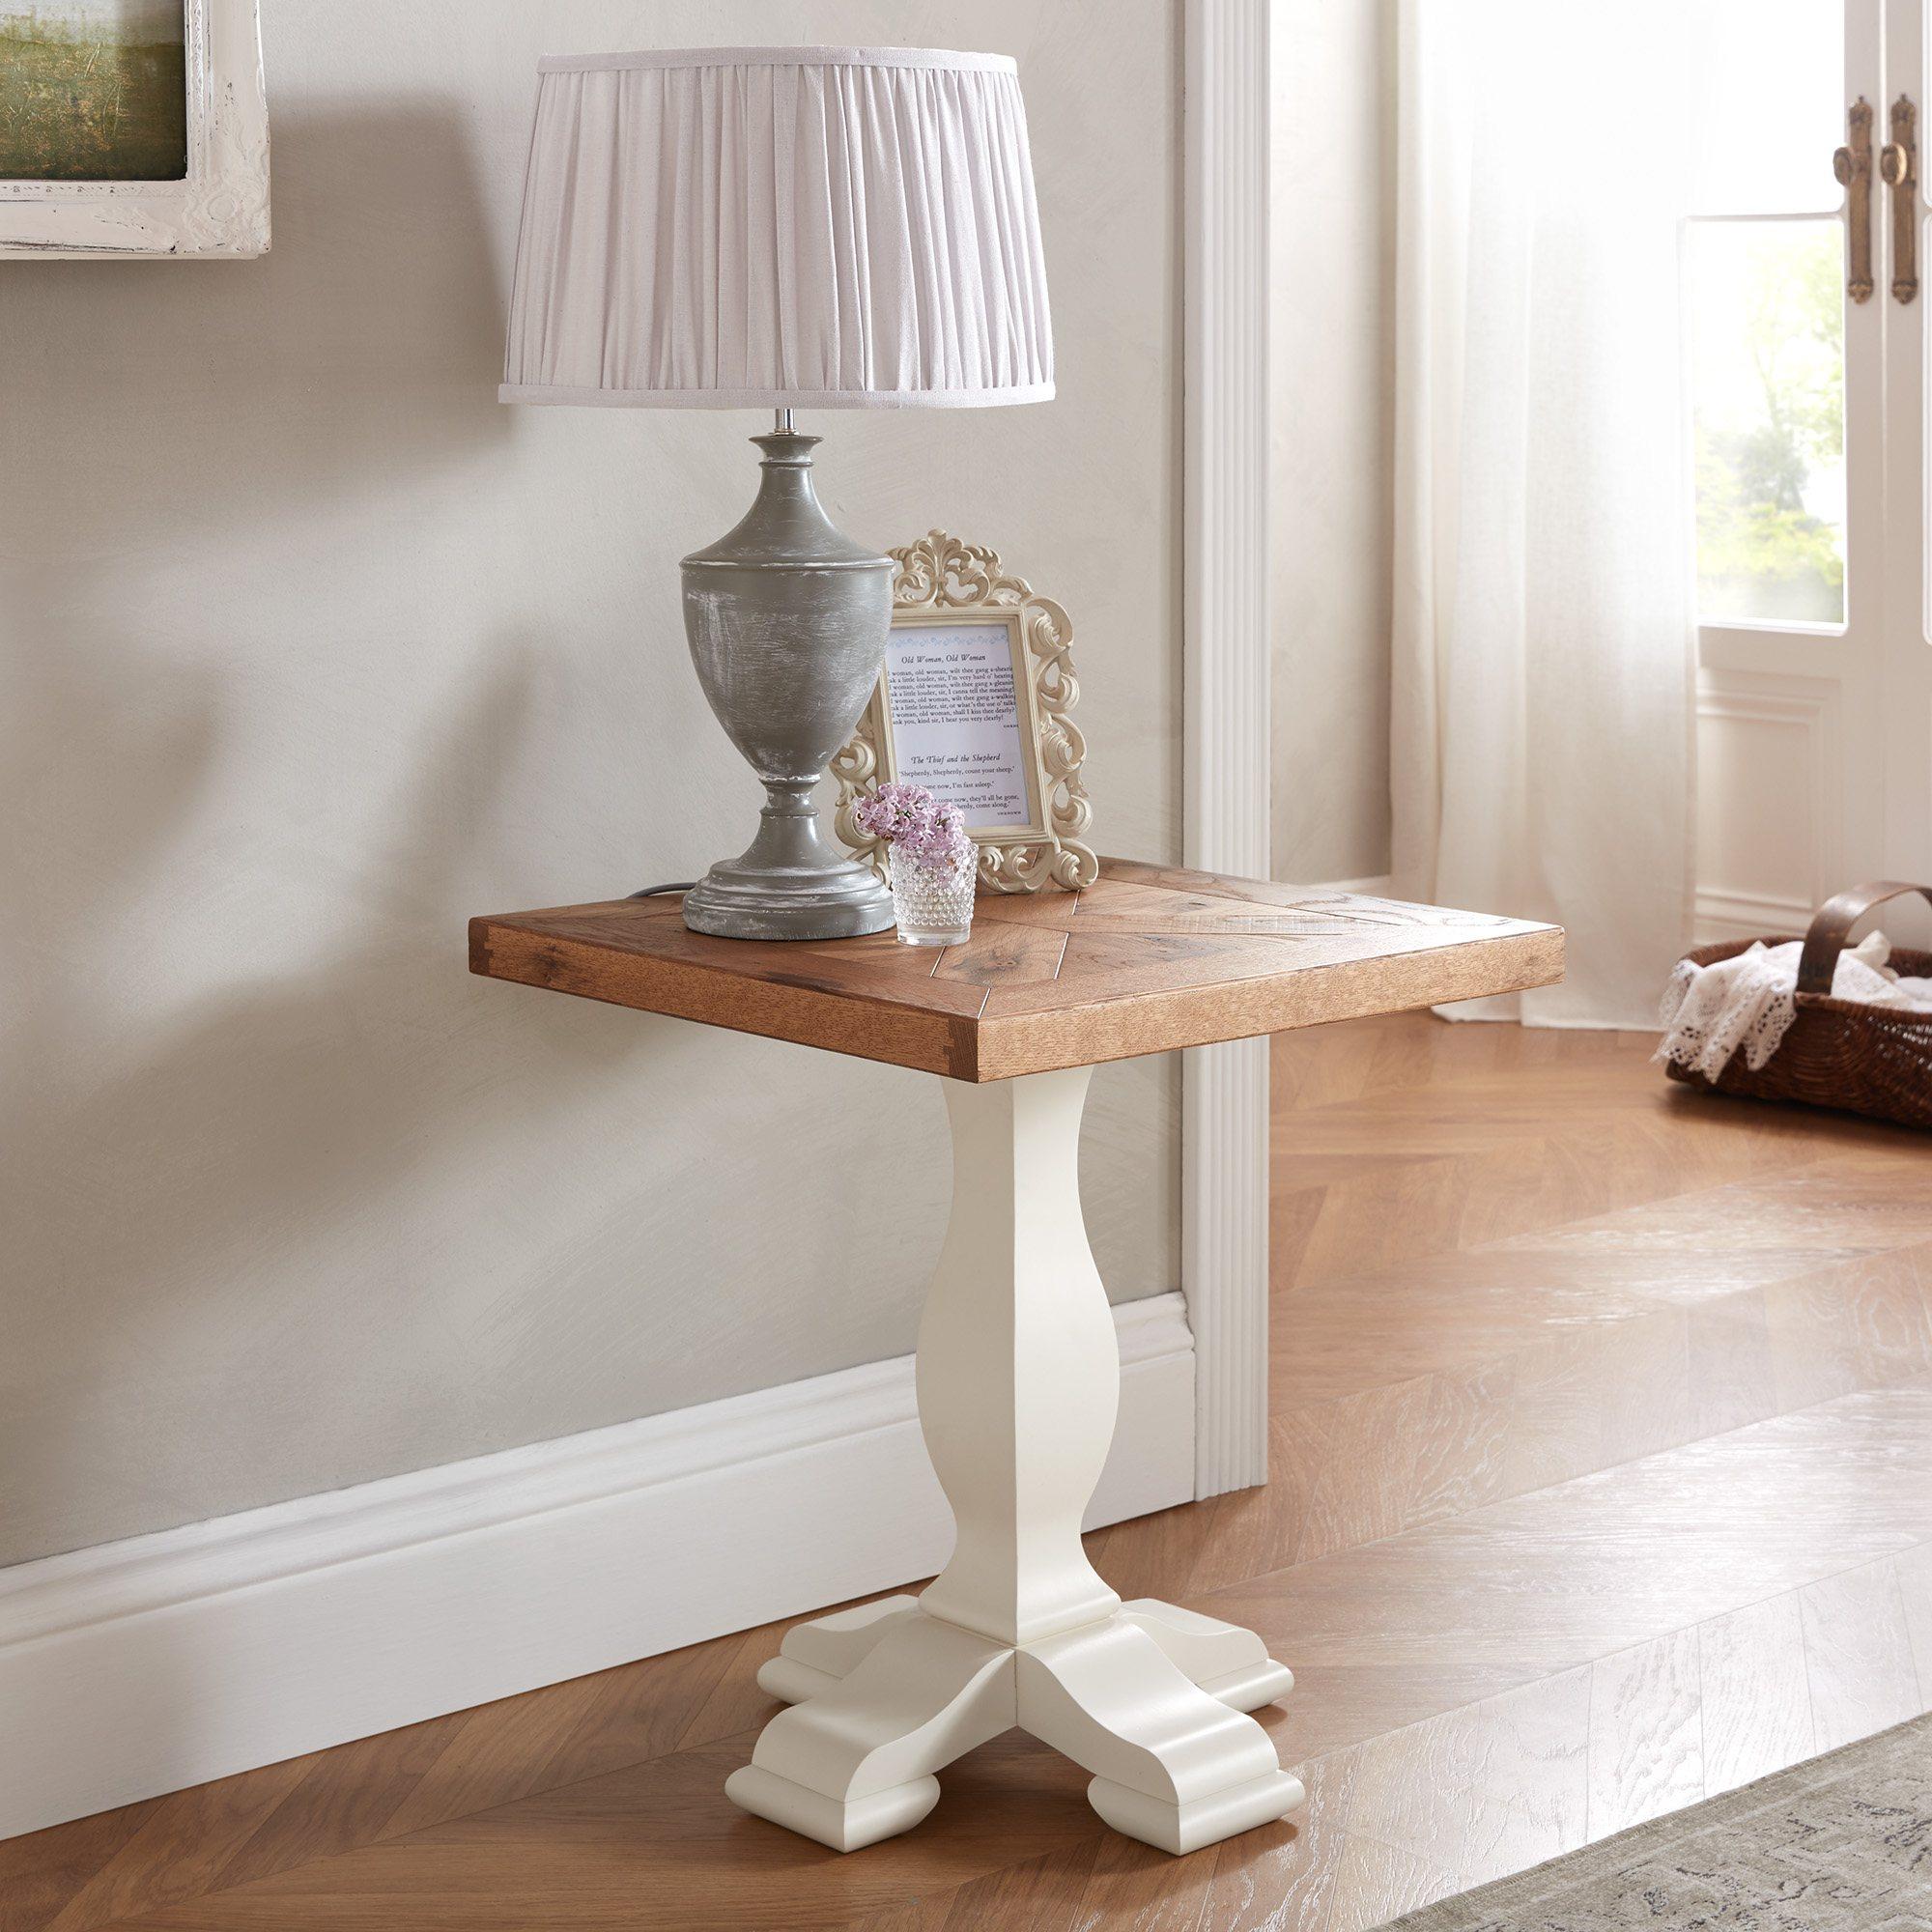 HIGHLAND LAMP TABLE - L51cm x D51cm x H56cm